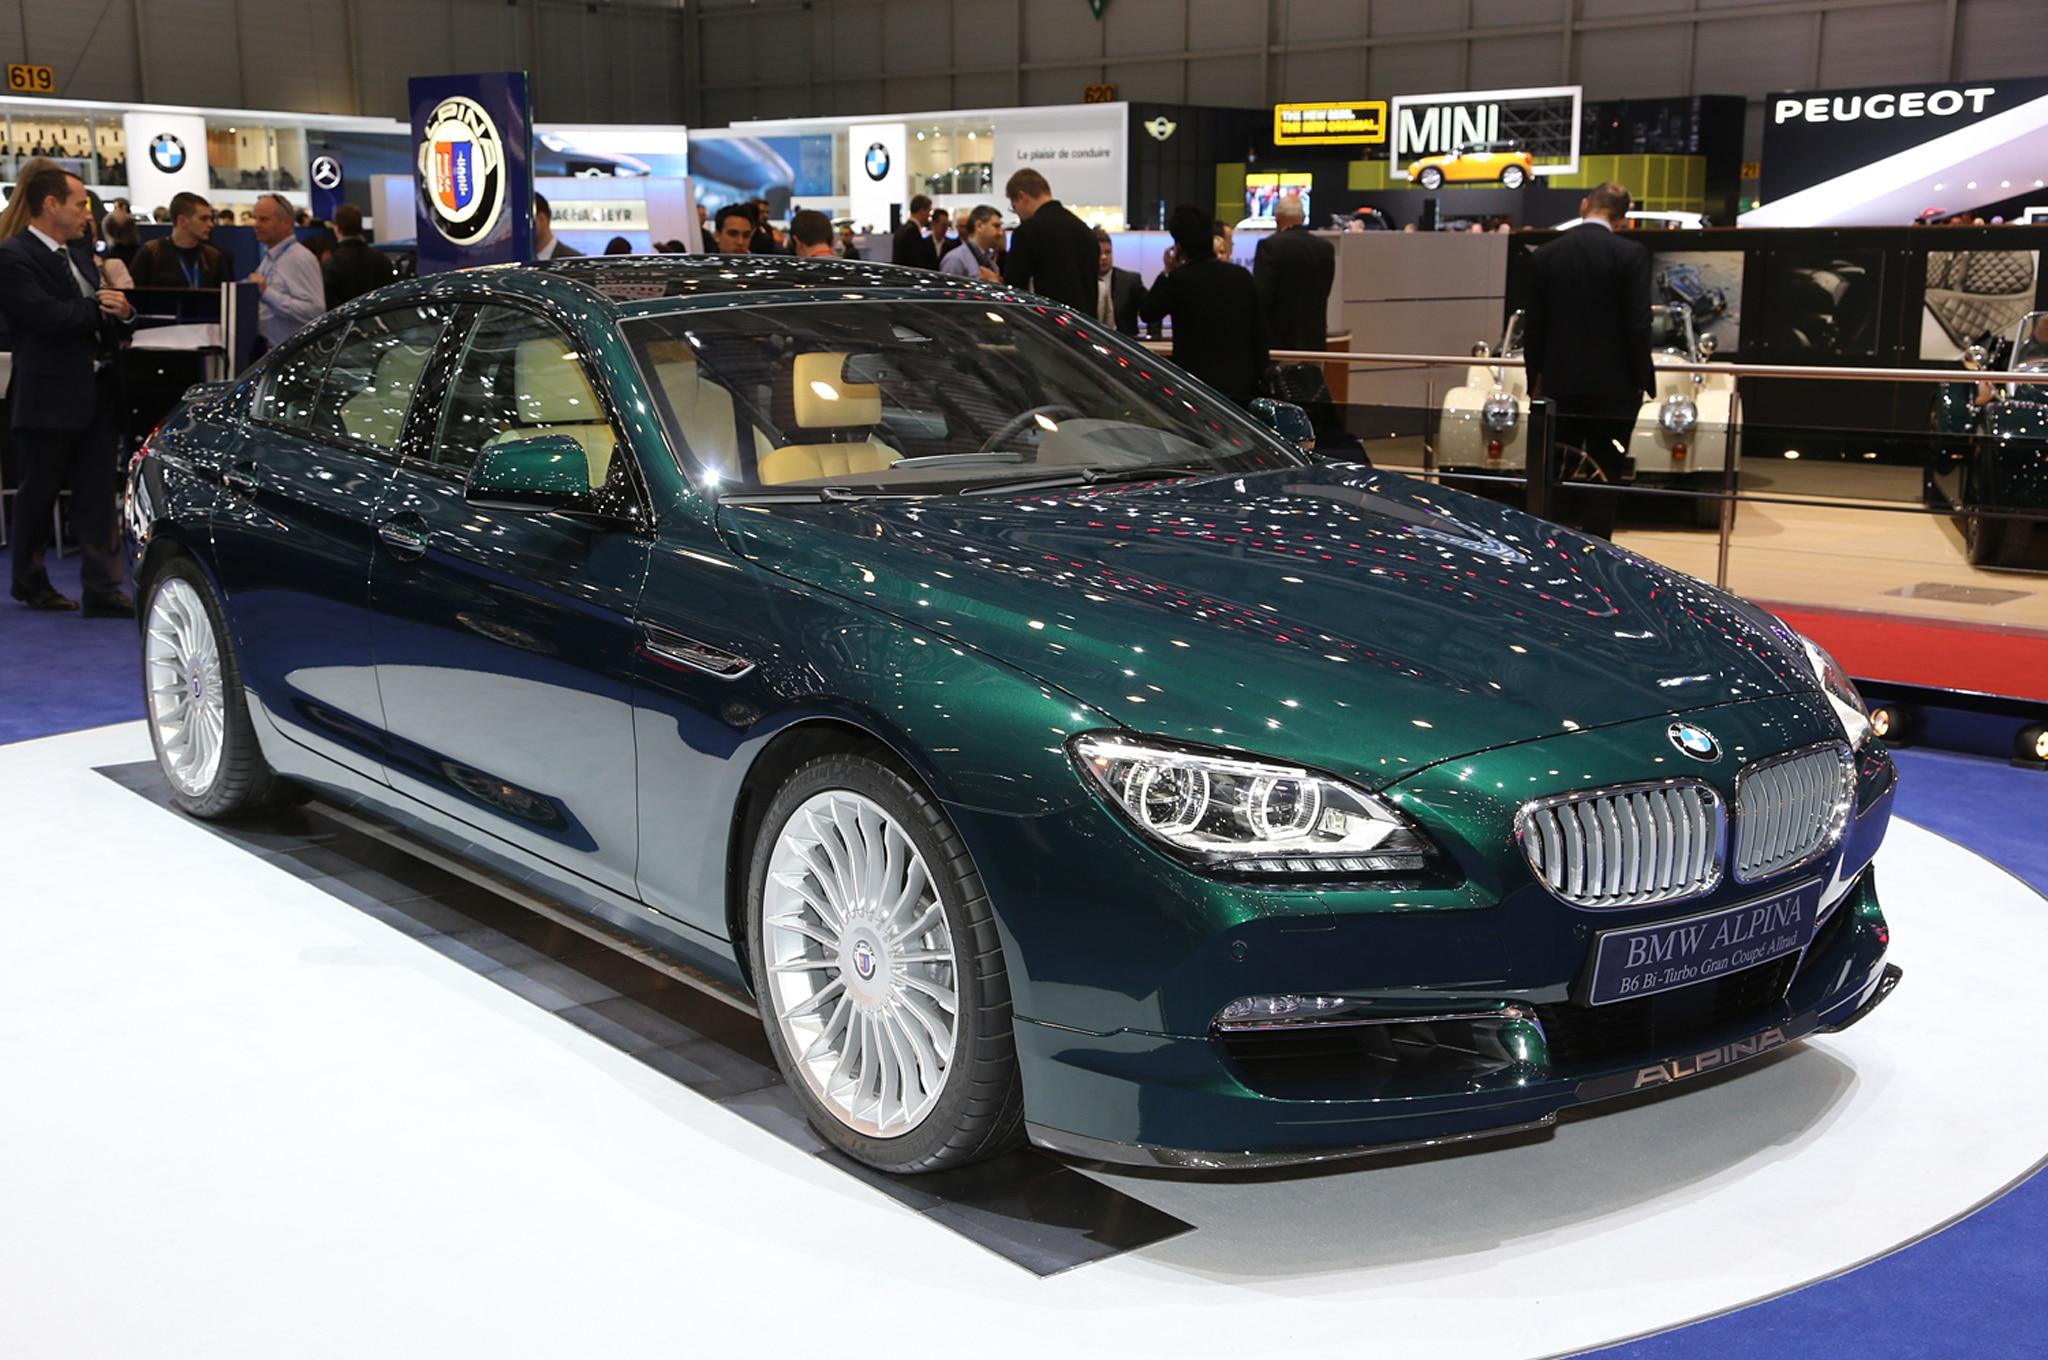 2015 BMW Alpina B6 xDrive Gran Coupe Revealed - Automobile ...